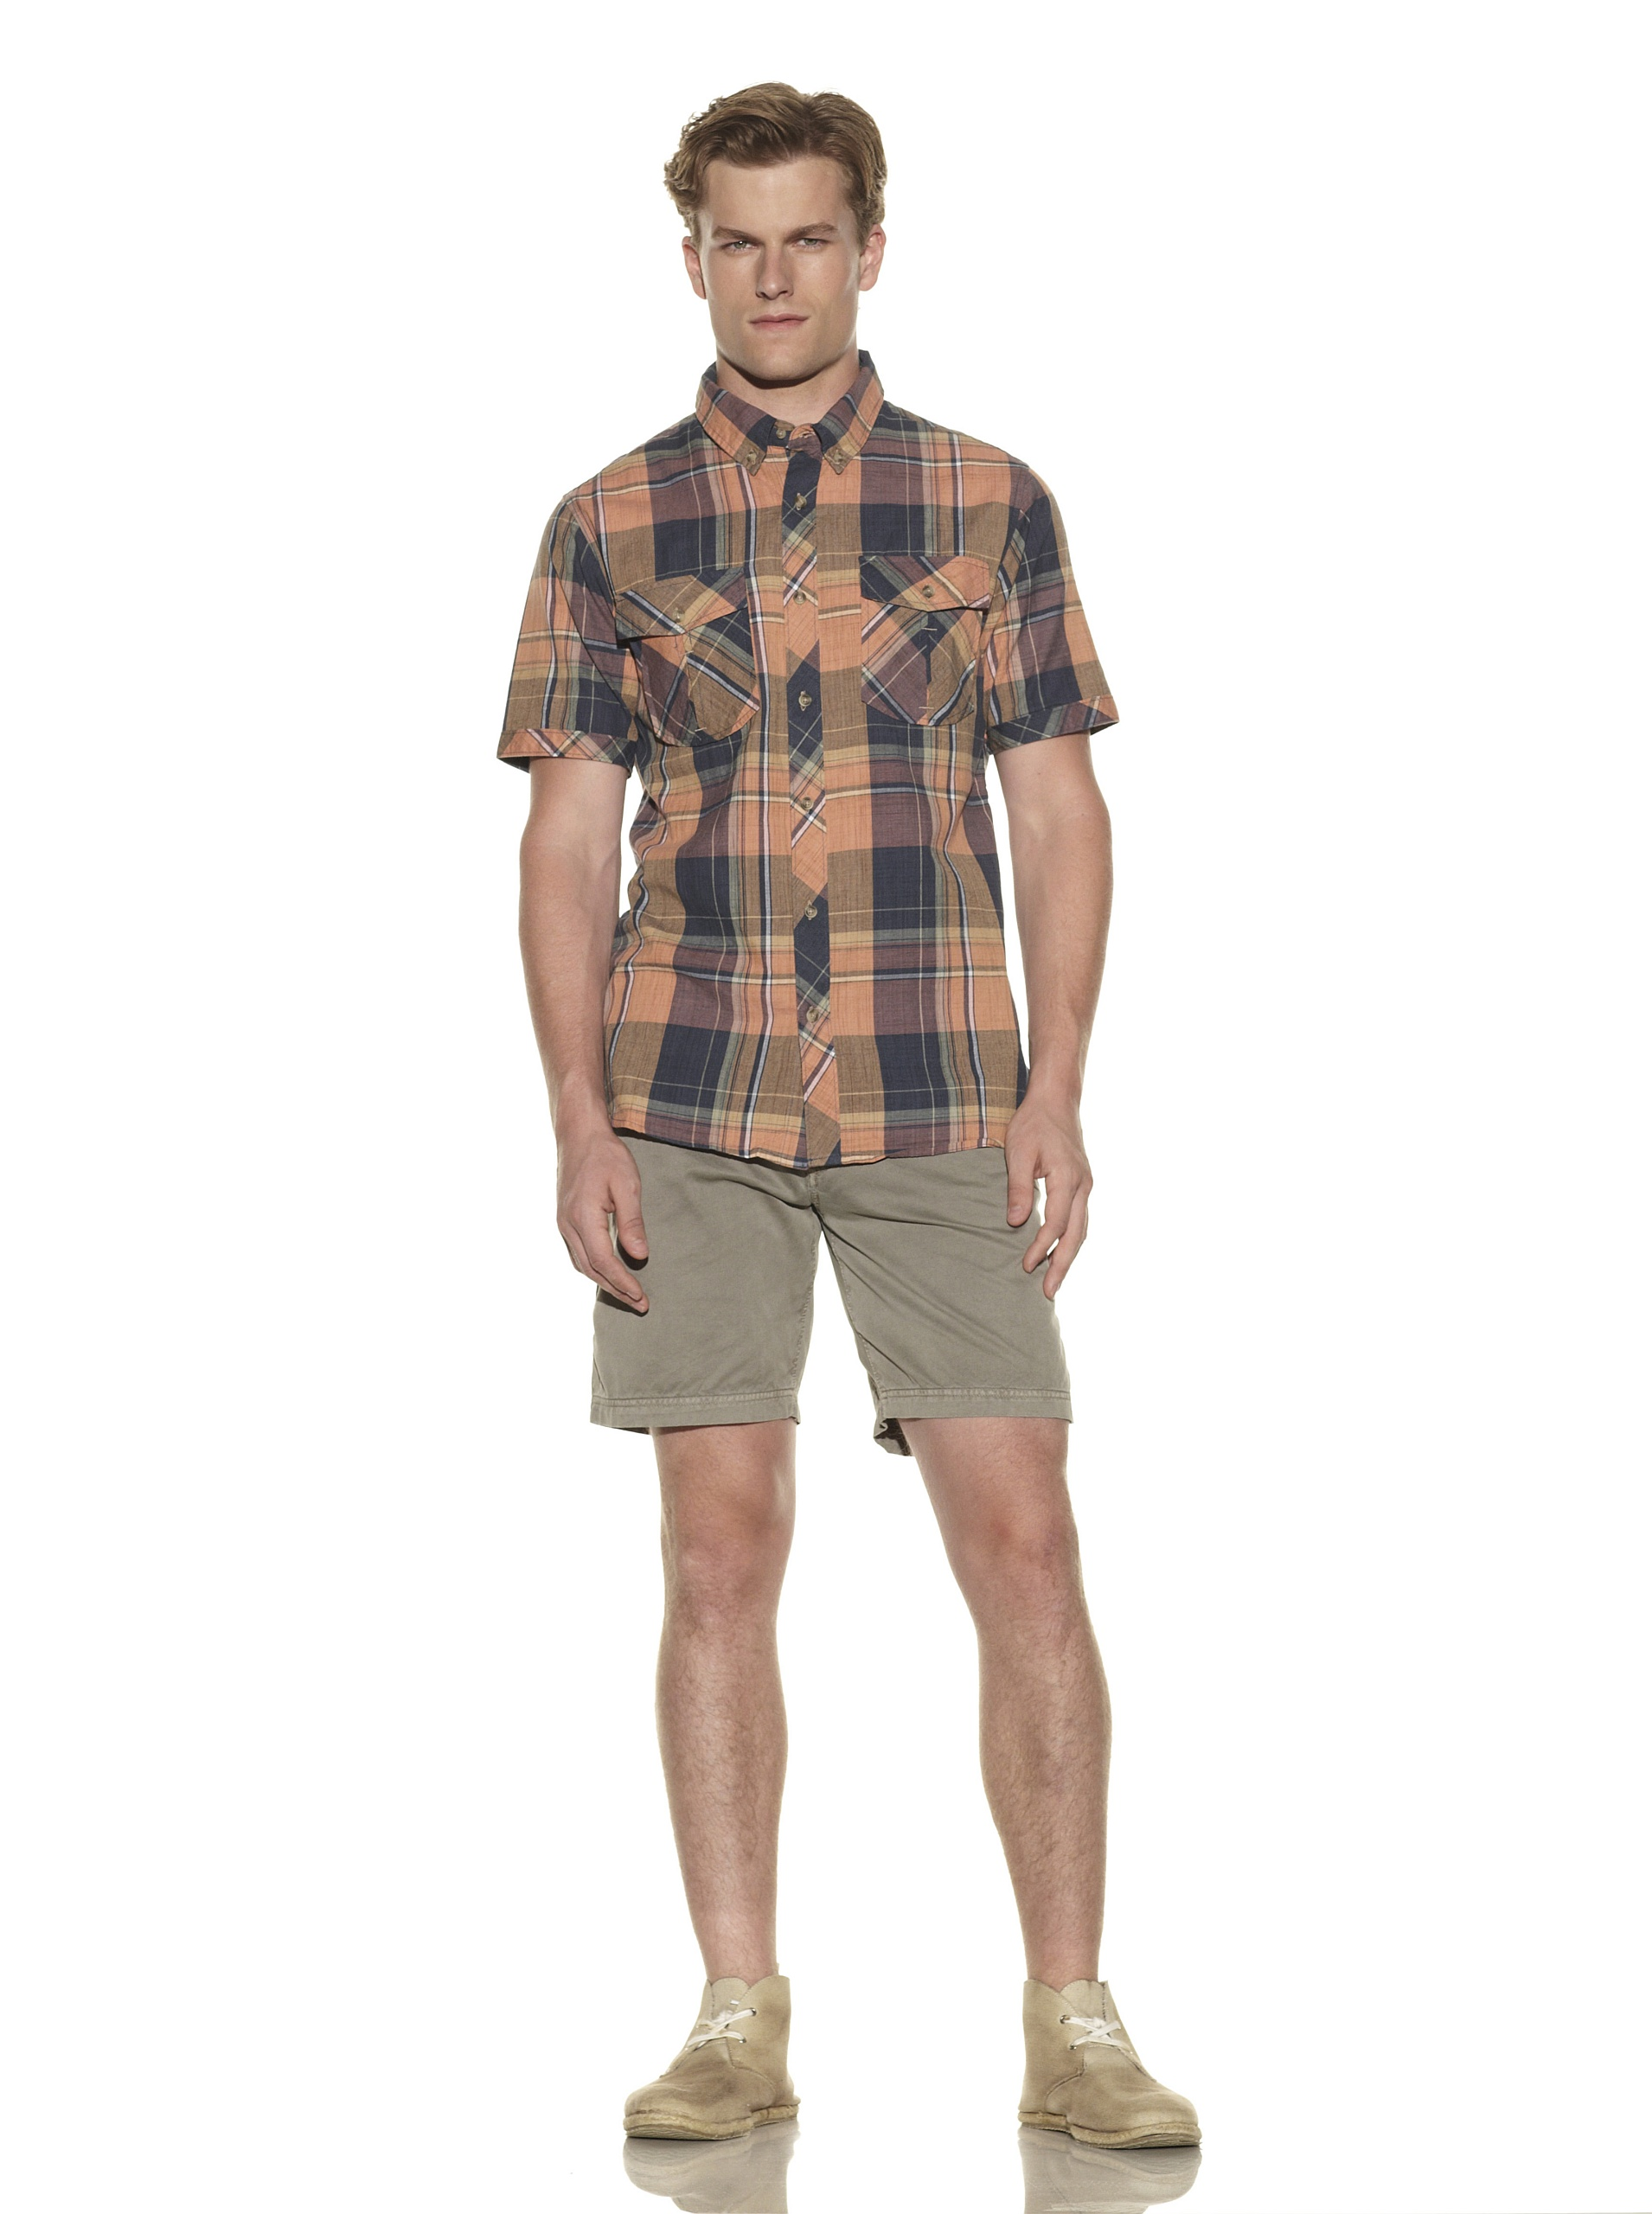 nüco Men's Short Sleeve Woven Plaid Shirt (Dark Teal)